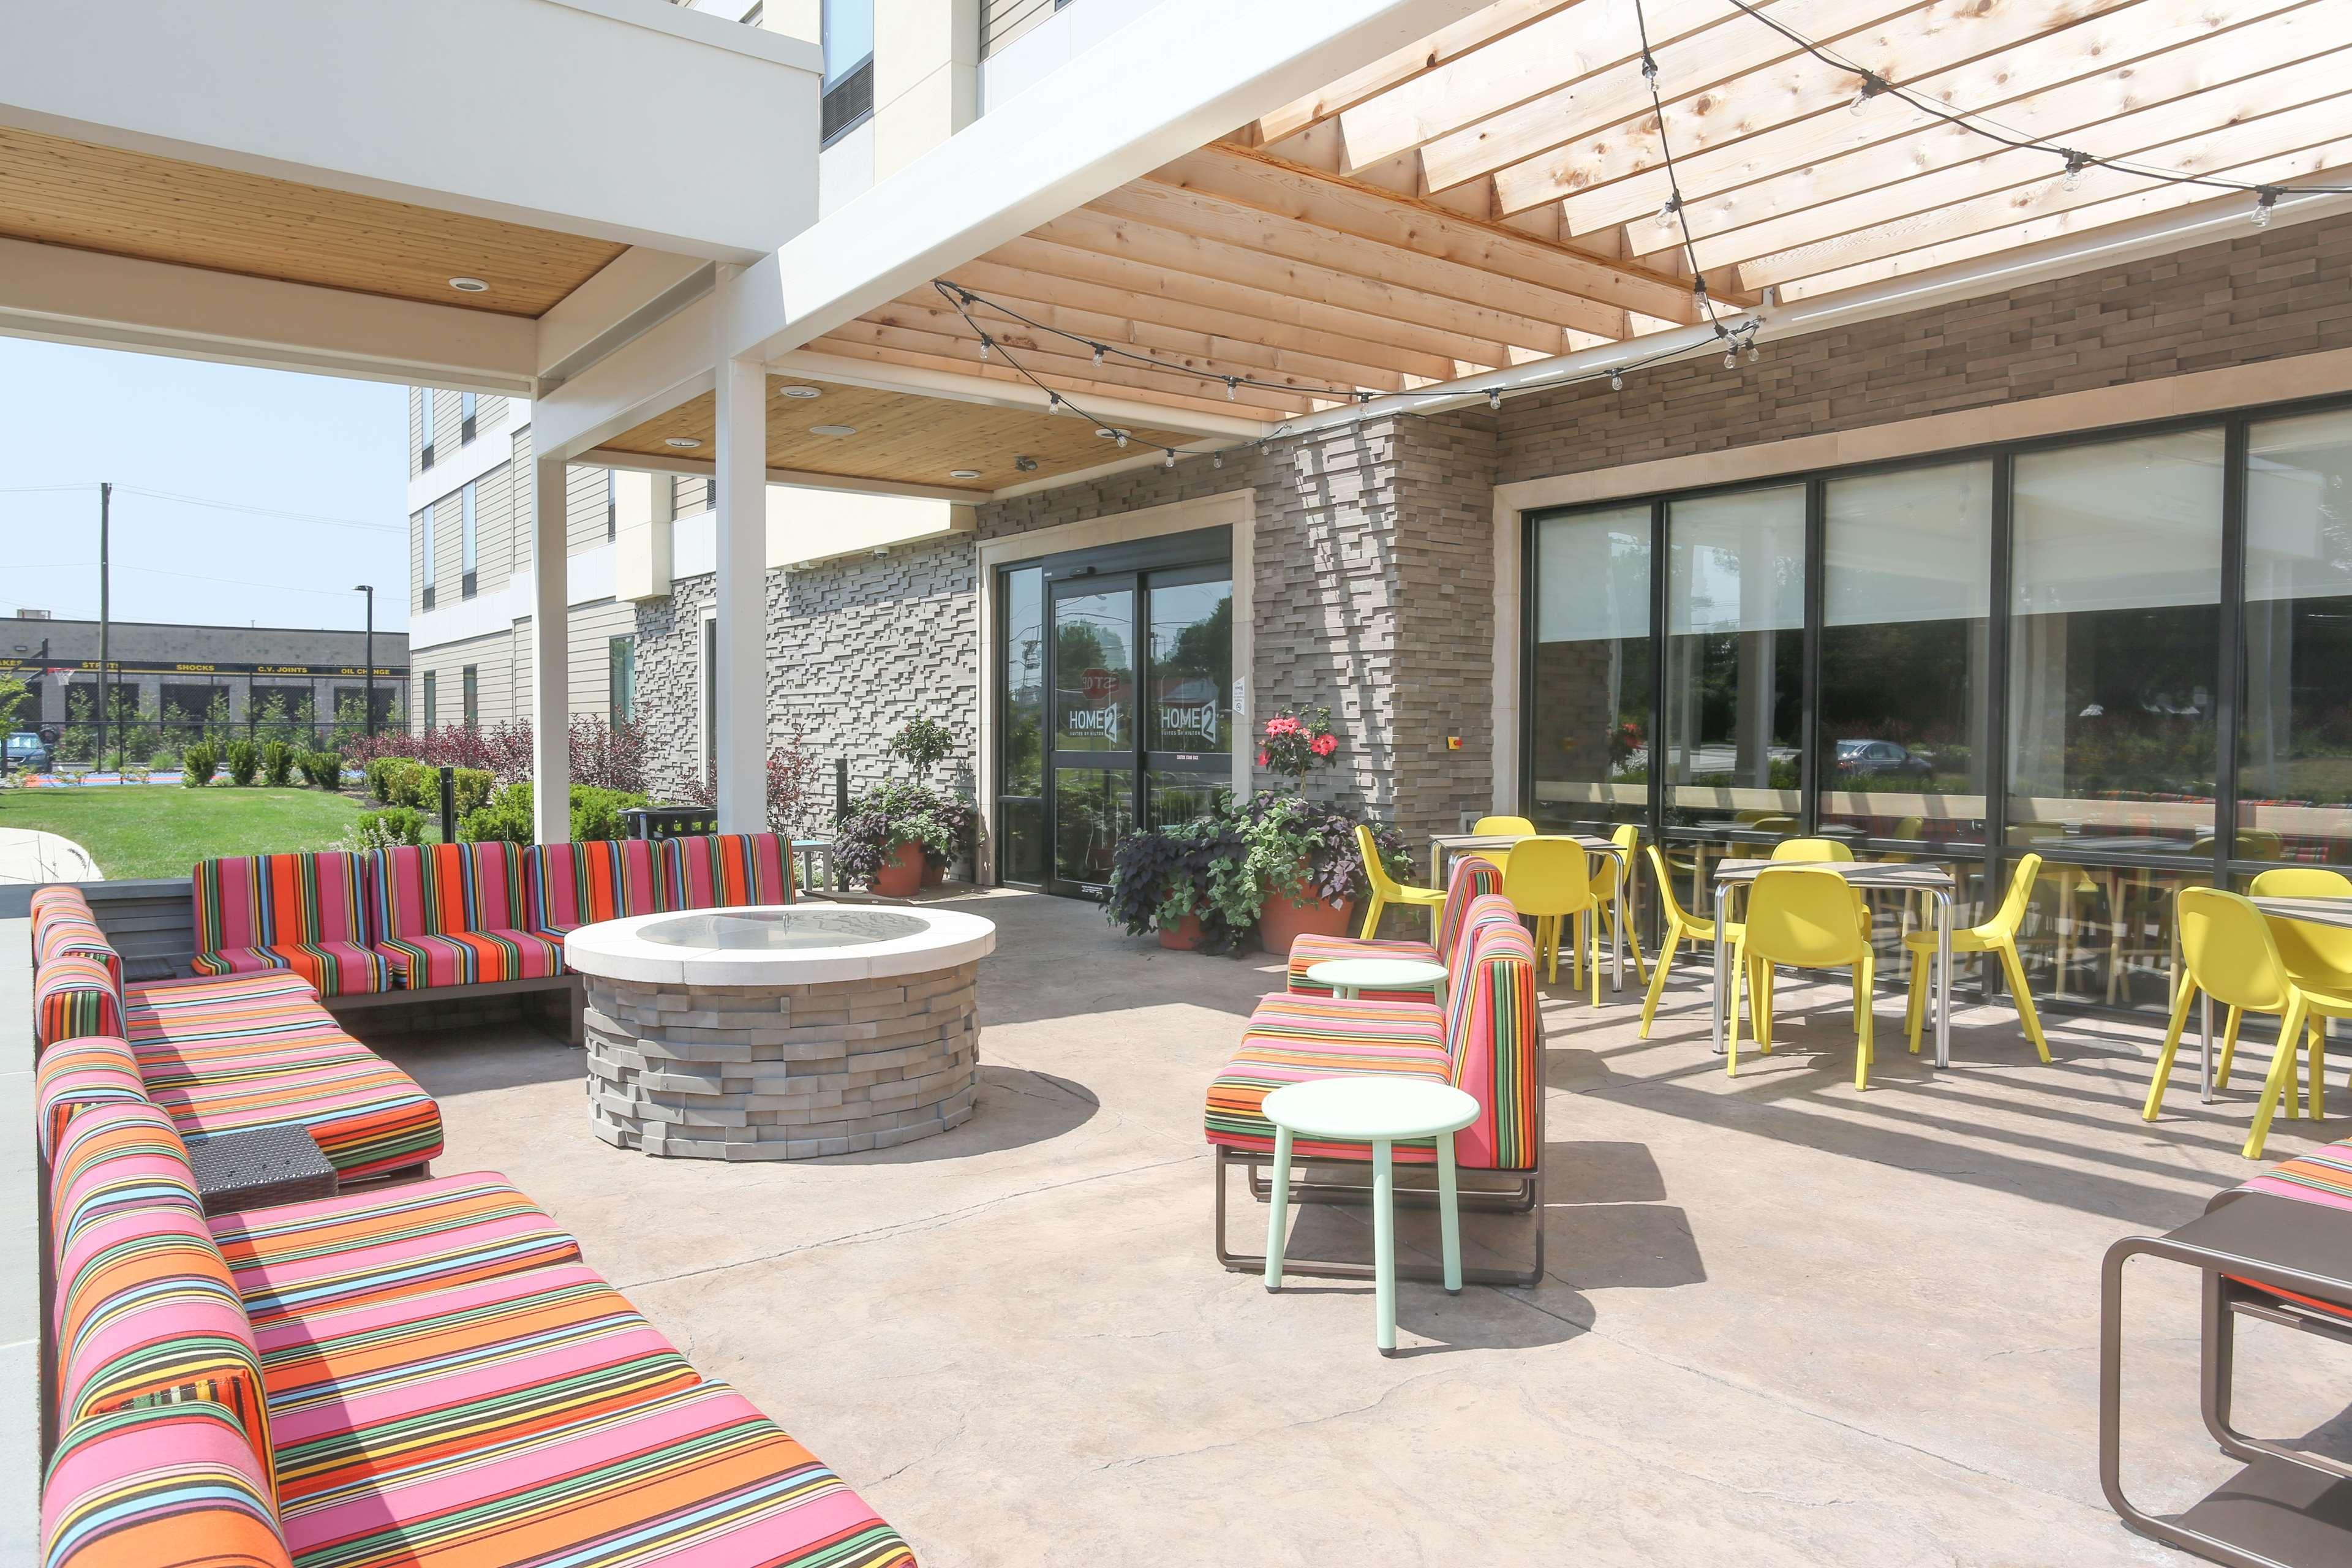 Home2 Suites by Hilton Bordentown image 3